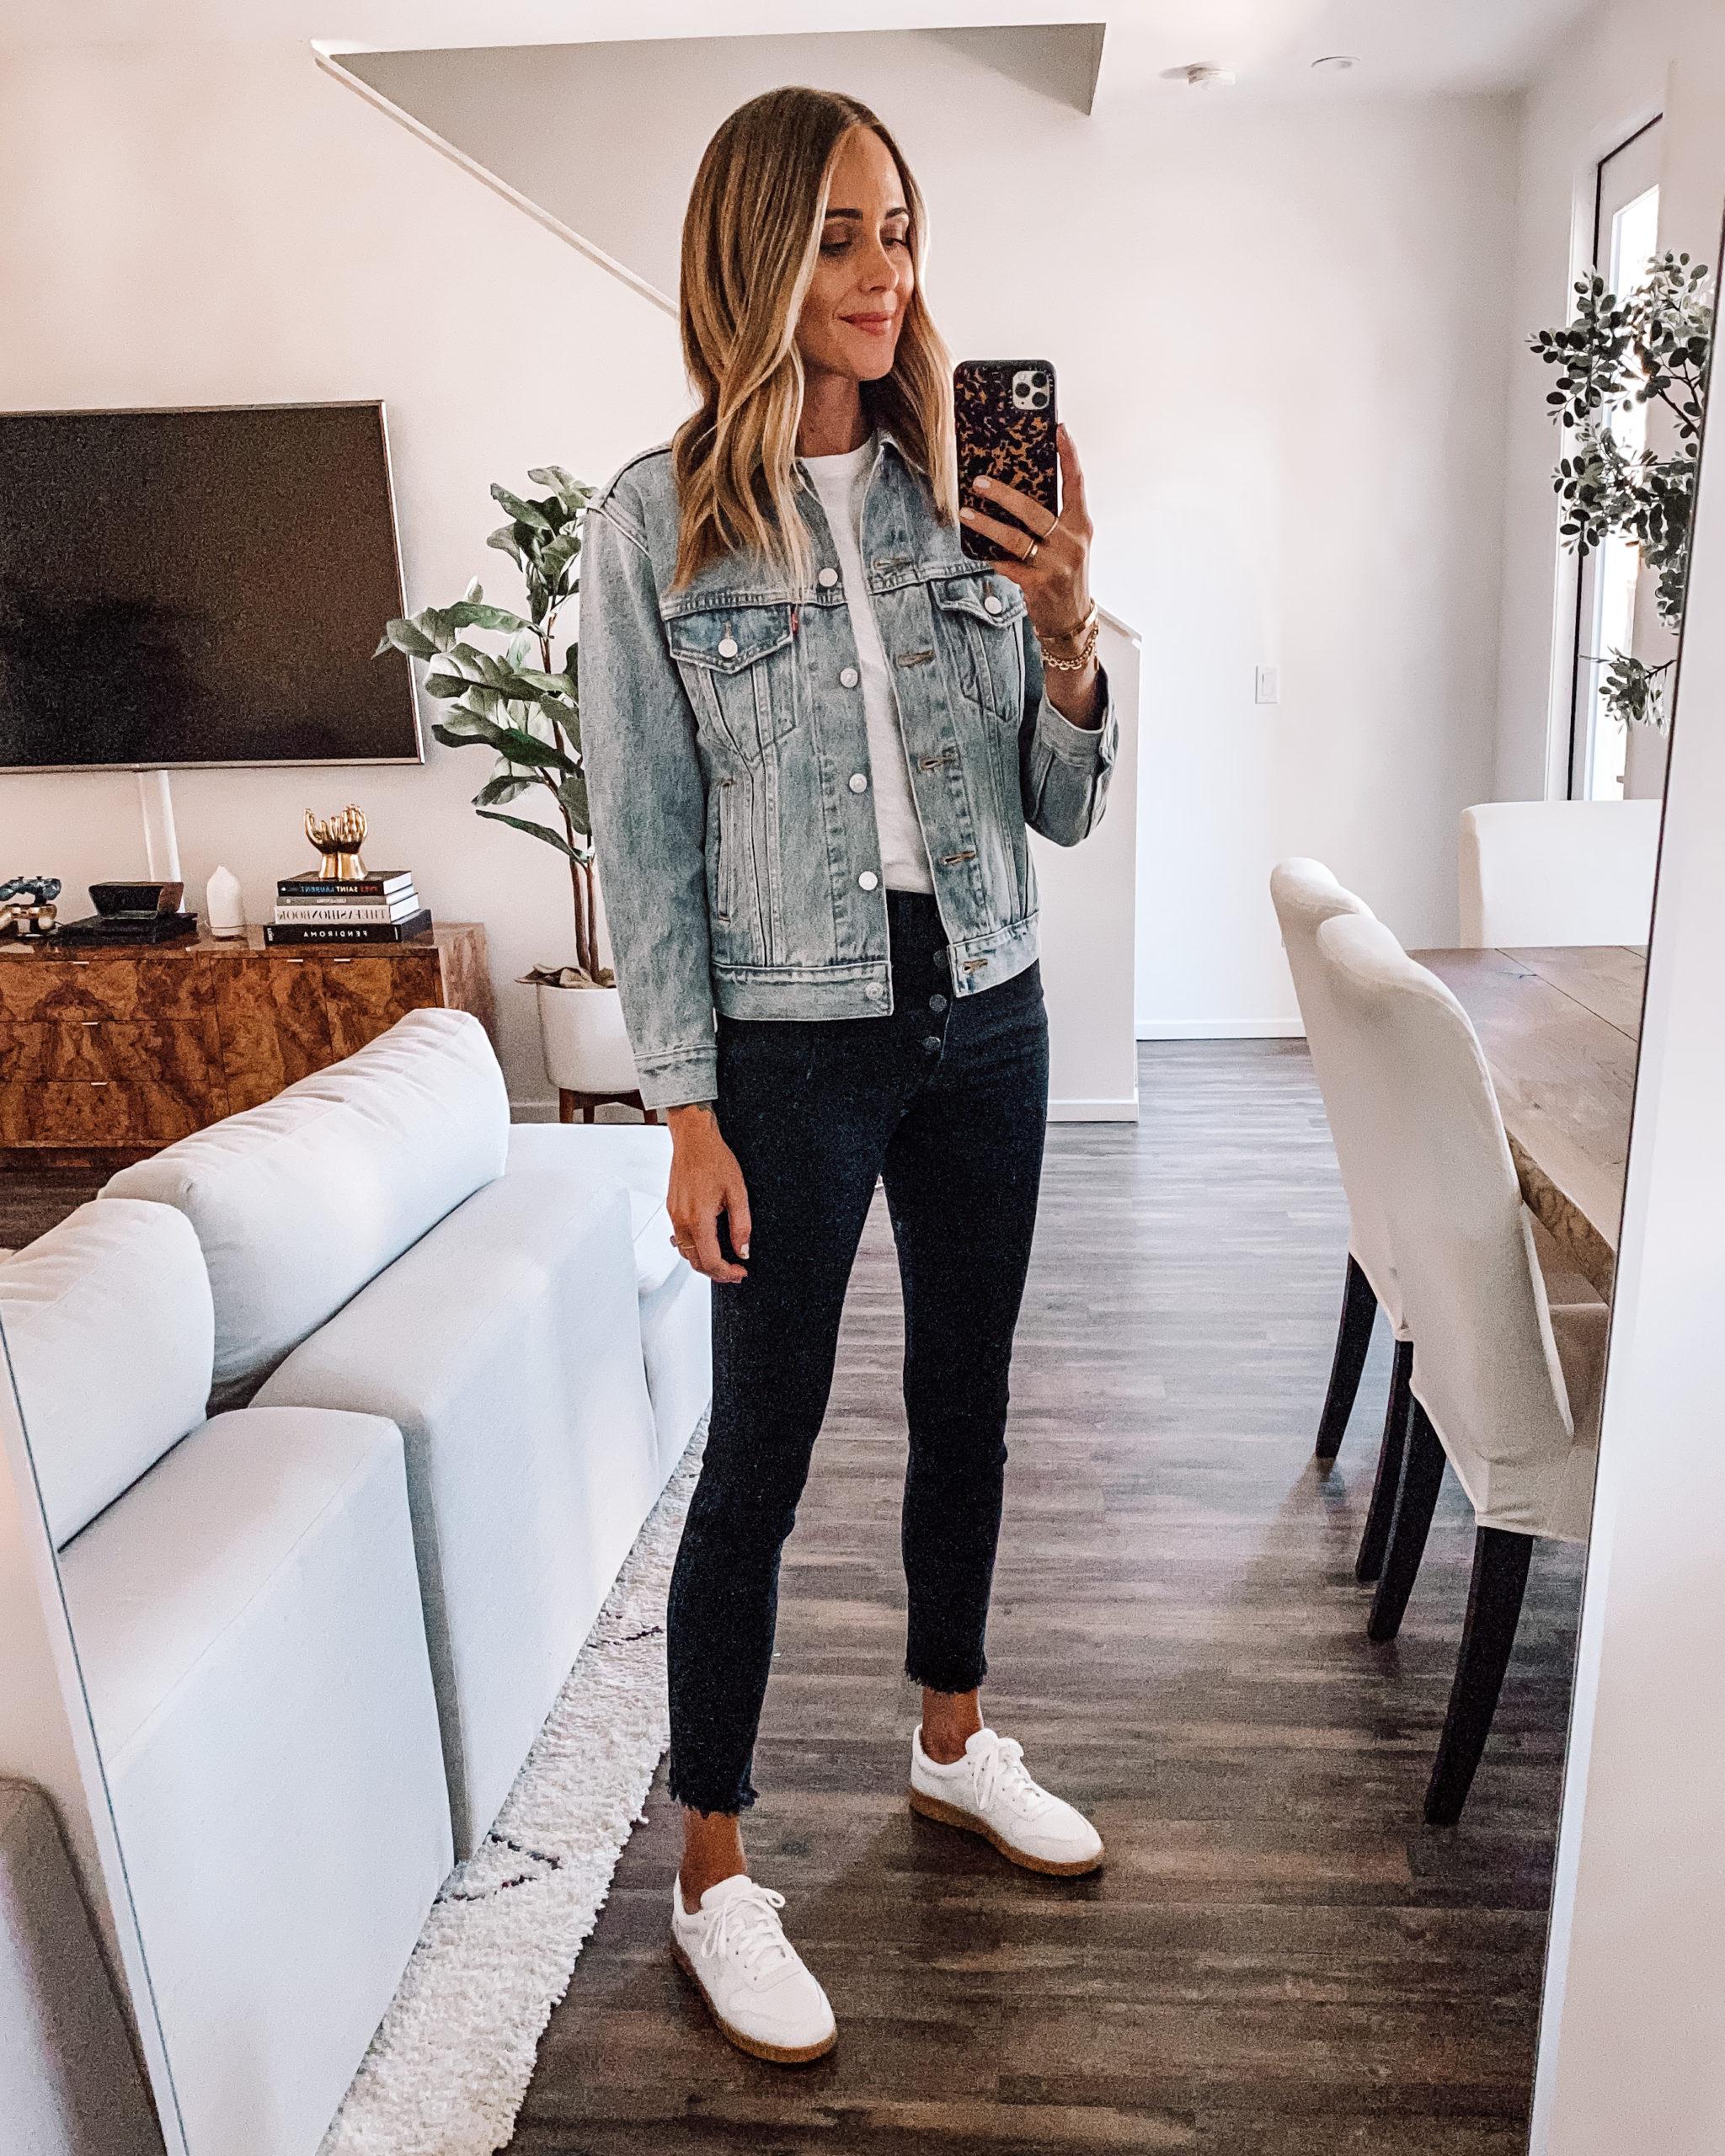 Fashion Jackson Wearing Levis Light Wash Denim Jacket White Tshirt Black Skinny Jeans Everlane White Sneakers 1